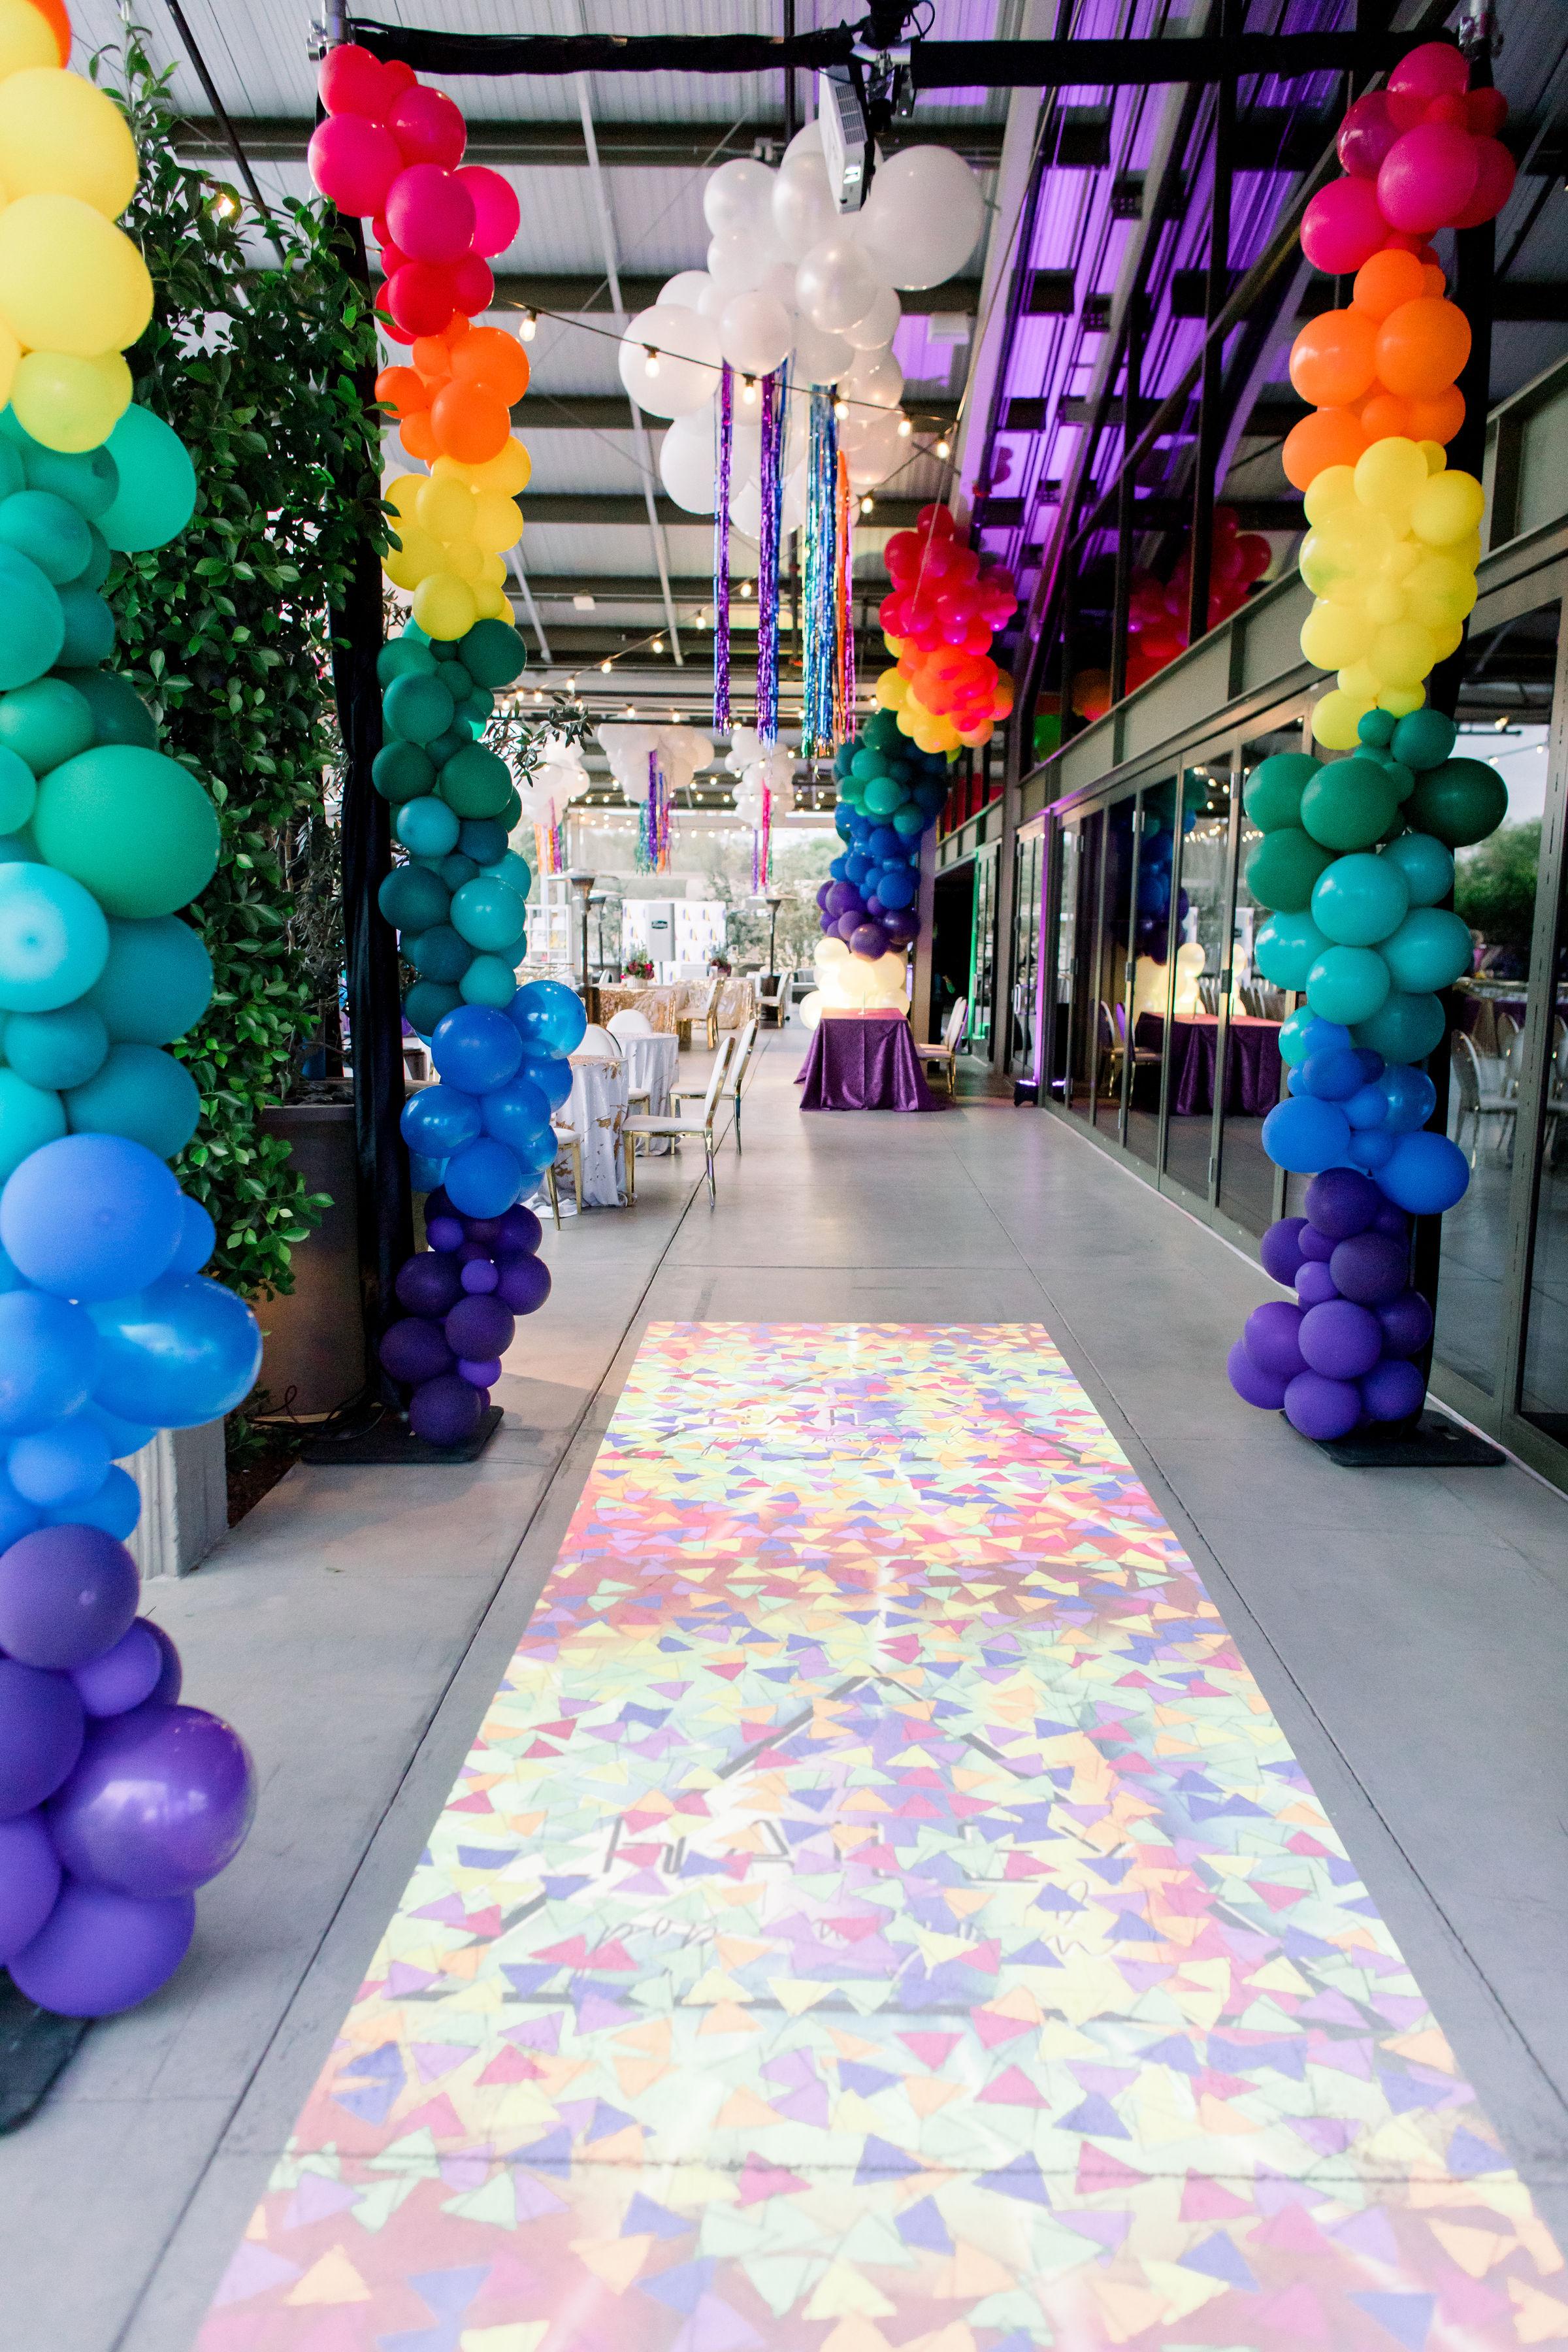 8 rainbow balloon garland balloon columns balloon clouds interactive light projection games rainbow bar mitzvah Life Design Events photos by Stephanie Heymann Photography.jpg